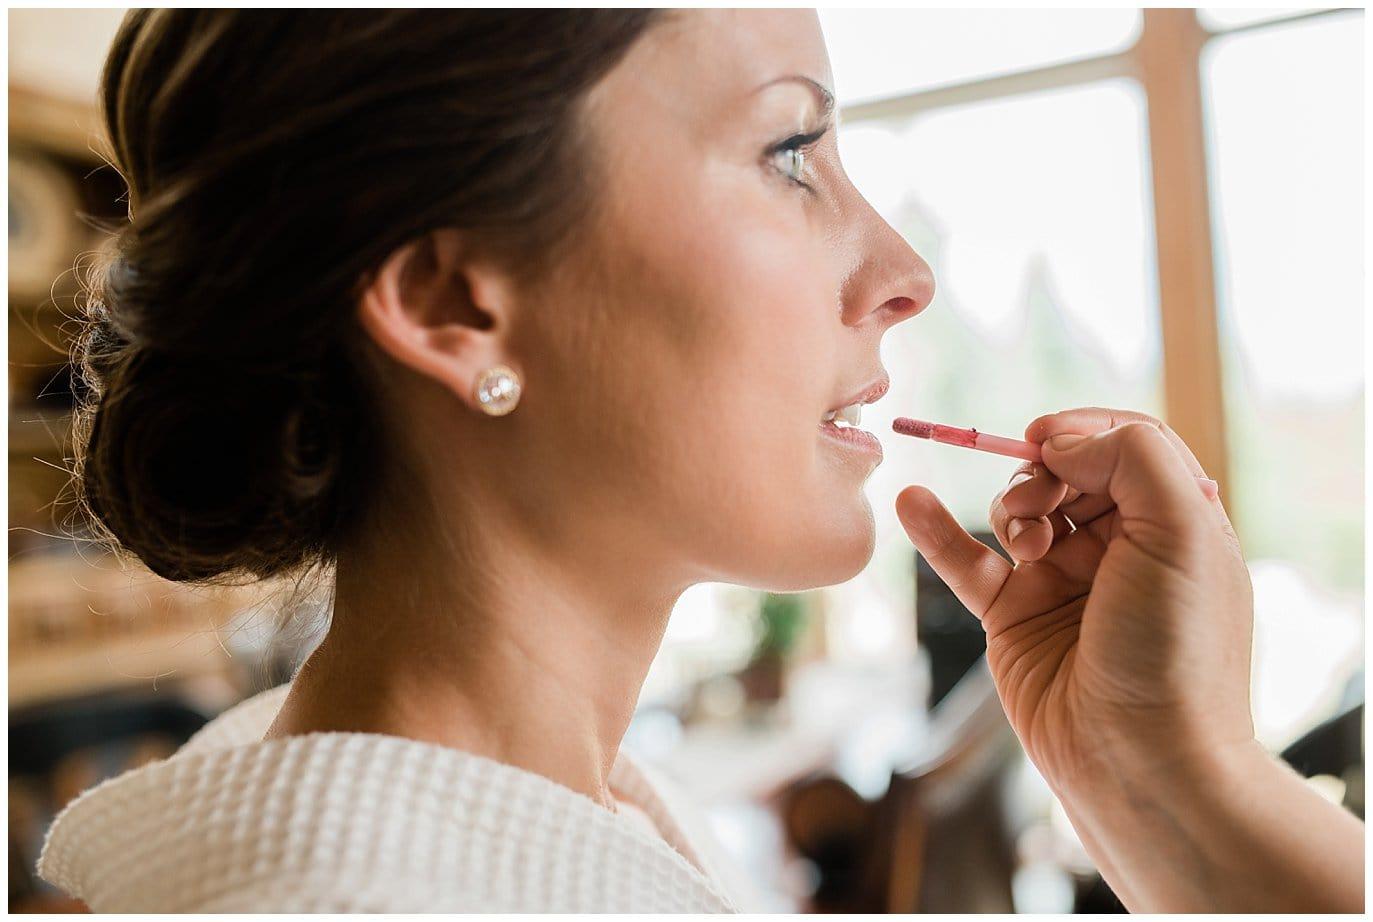 bride getting lipstick put on at Arapahoe Basin Black Mountain Lodge Wedding by Colorado Wedding Photographer Jennie Crate